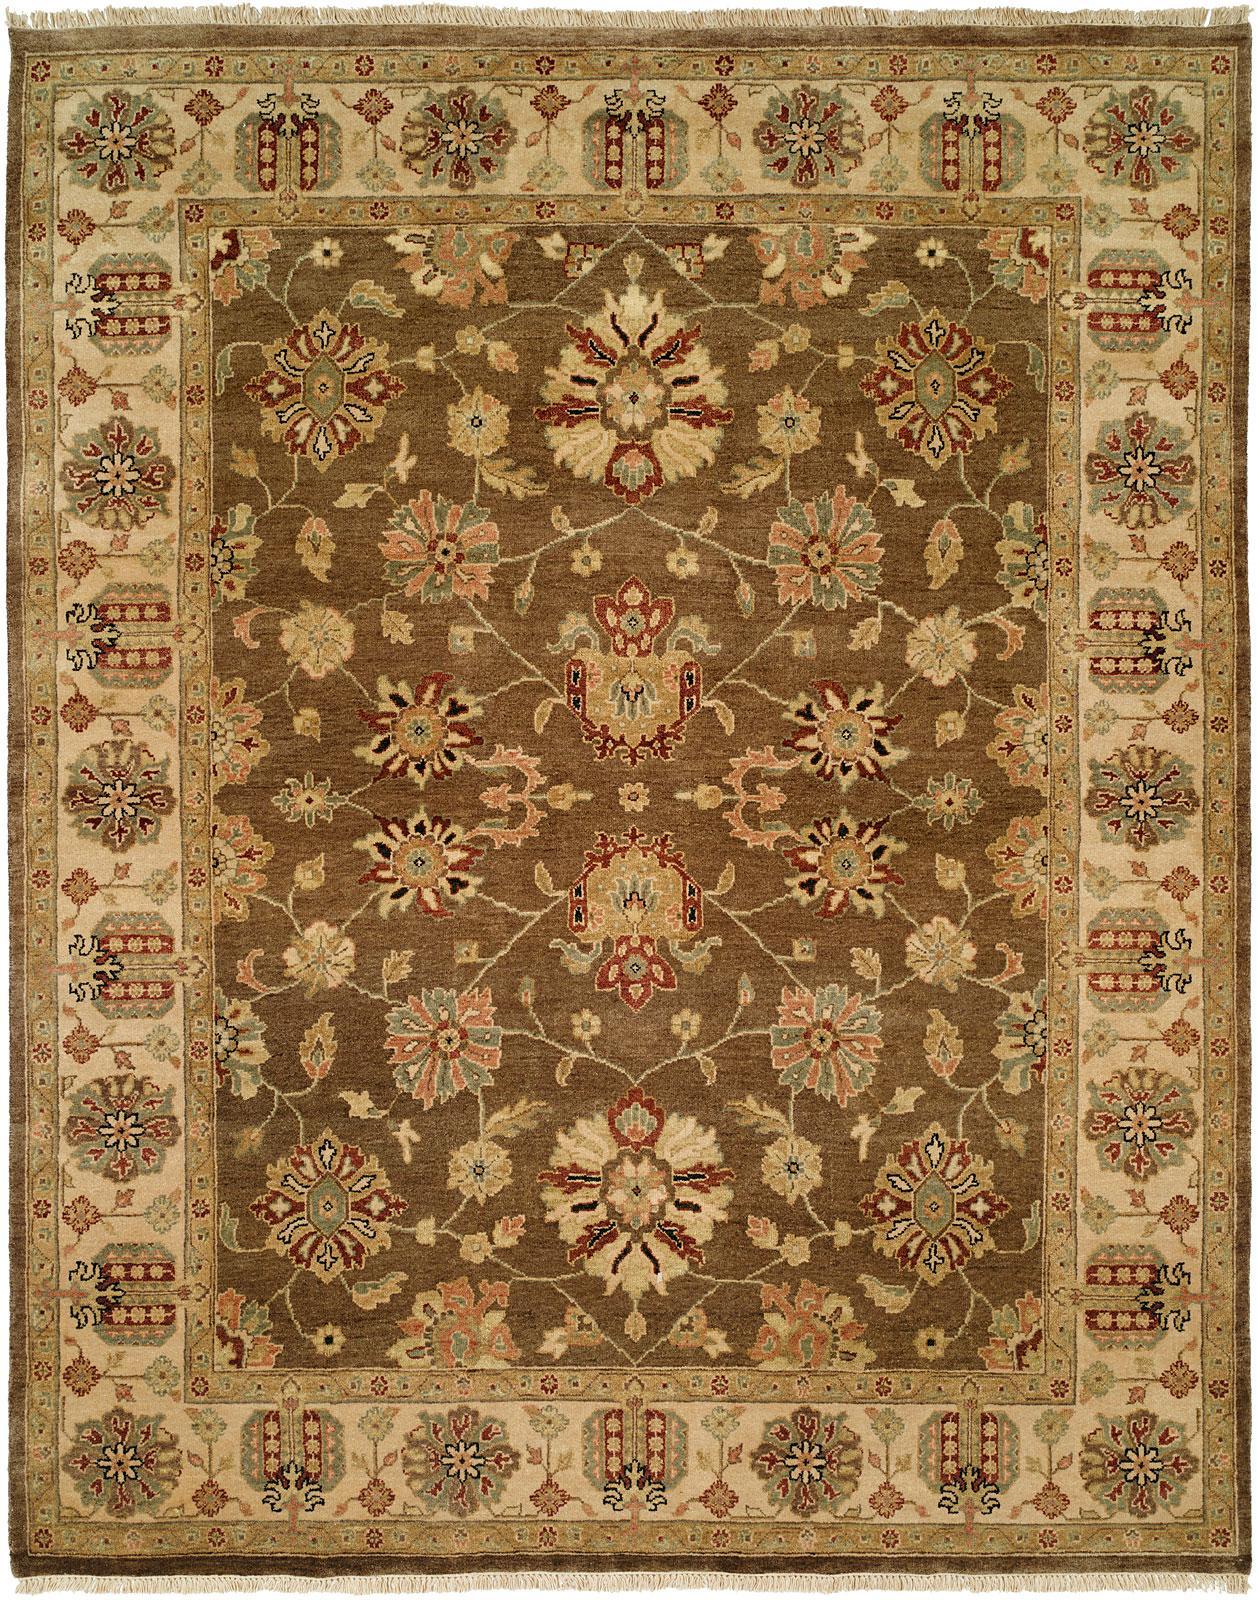 Oak Collection Sienna Ivory Kirishian Imported Rug Co